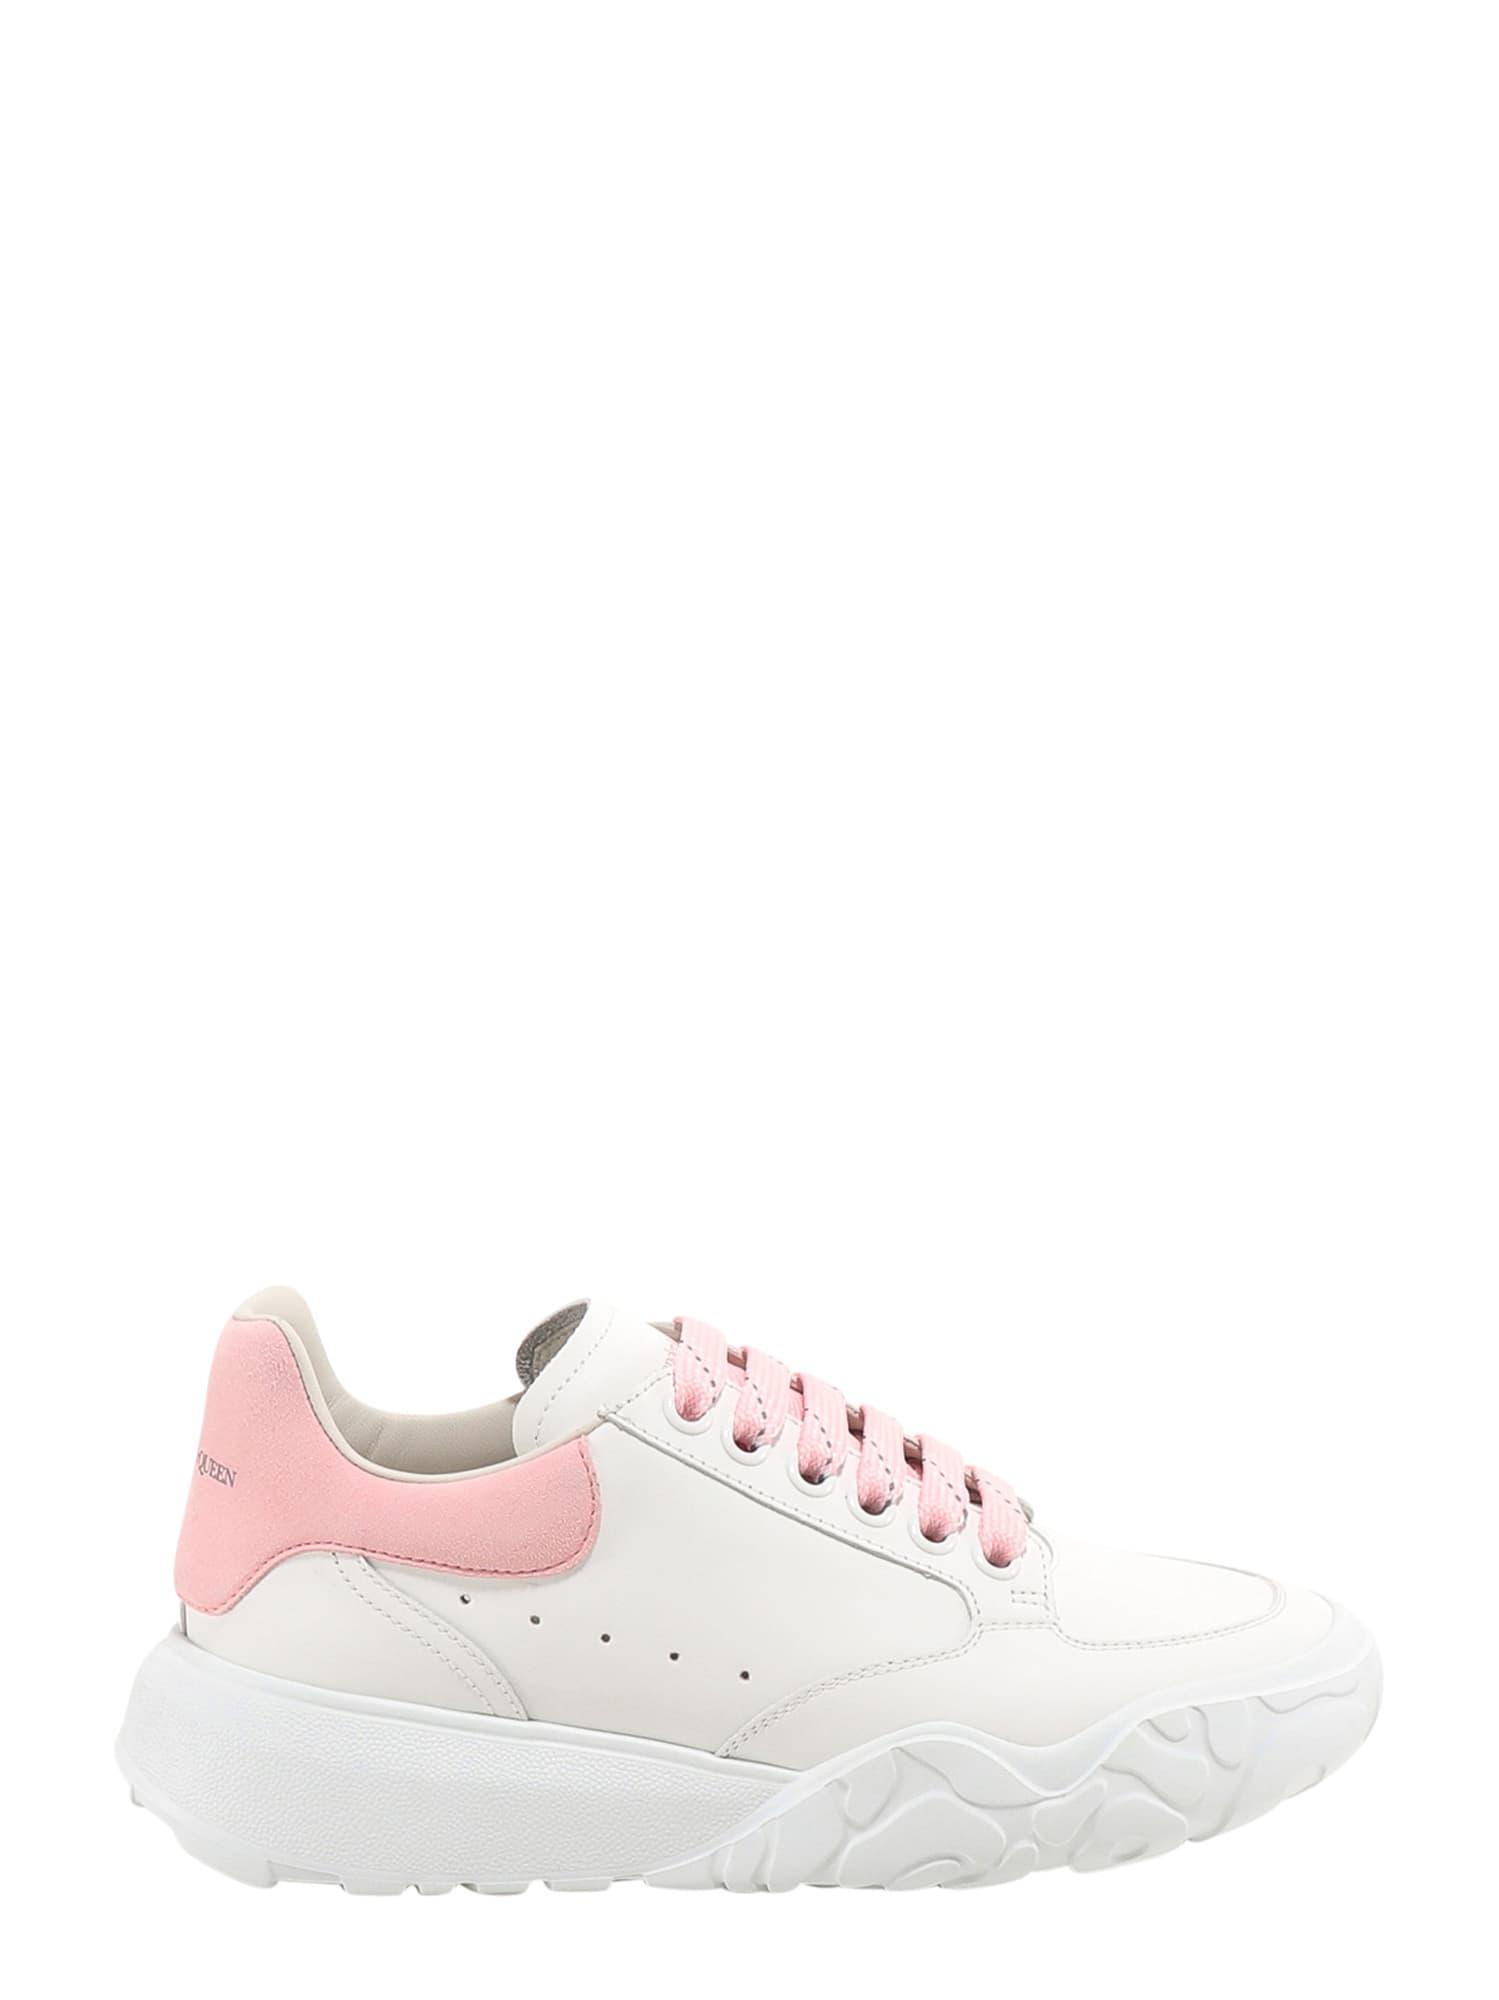 Buy Alexander McQueen Court Sneakers online, shop Alexander McQueen shoes with free shipping